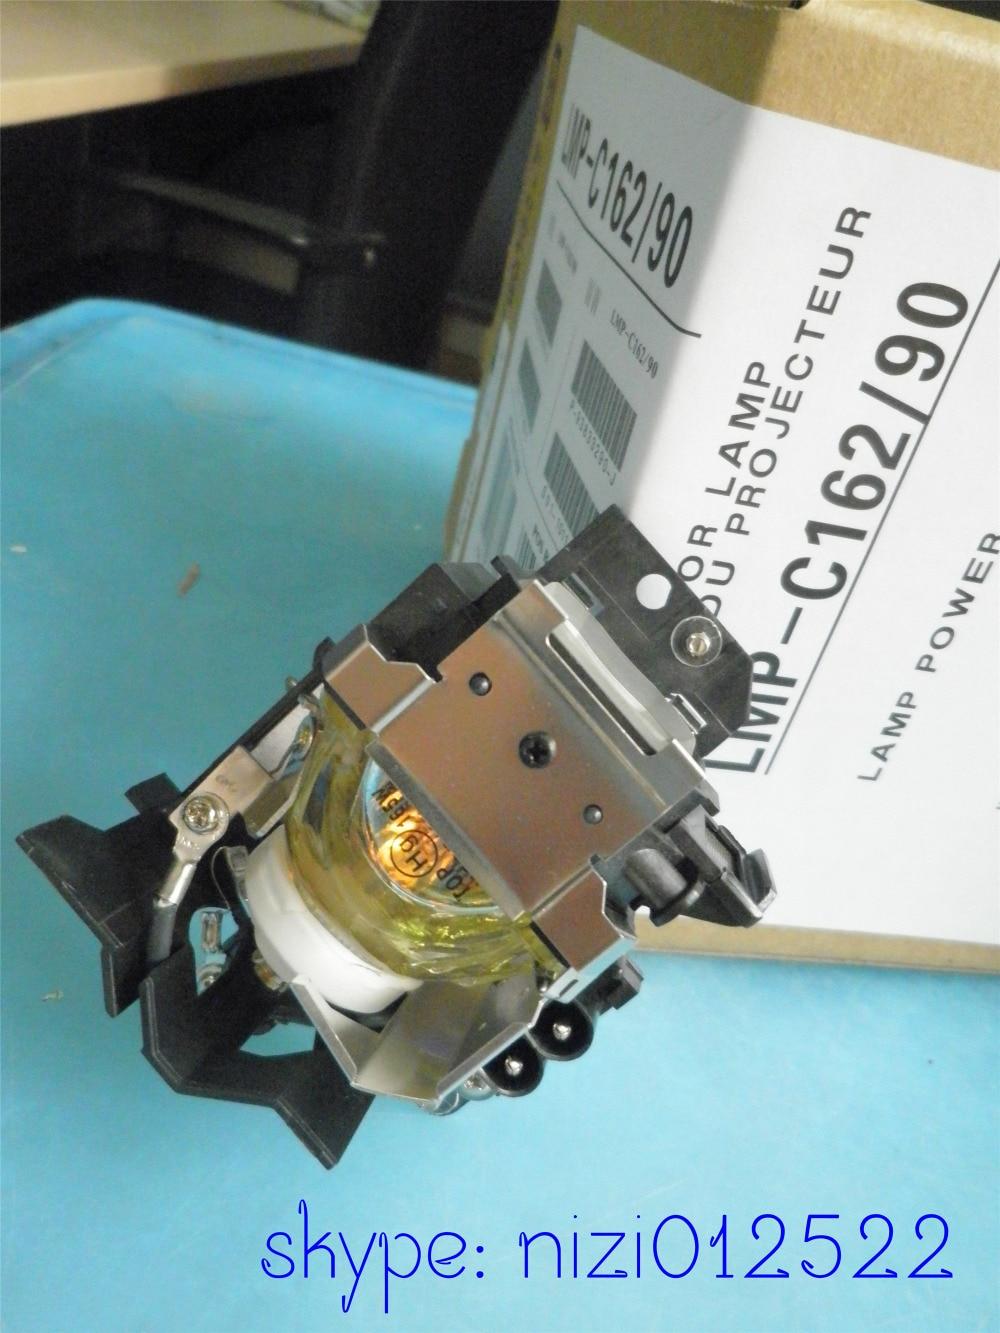 OEM Projector lamp BULB for SONY LMP-C162 VPL-CS20/VPL-CX20/VPL-ES3/VPL-EX3/VPL-CX20A/VPL-EX4/VPL-ES4/VPL-CS20A